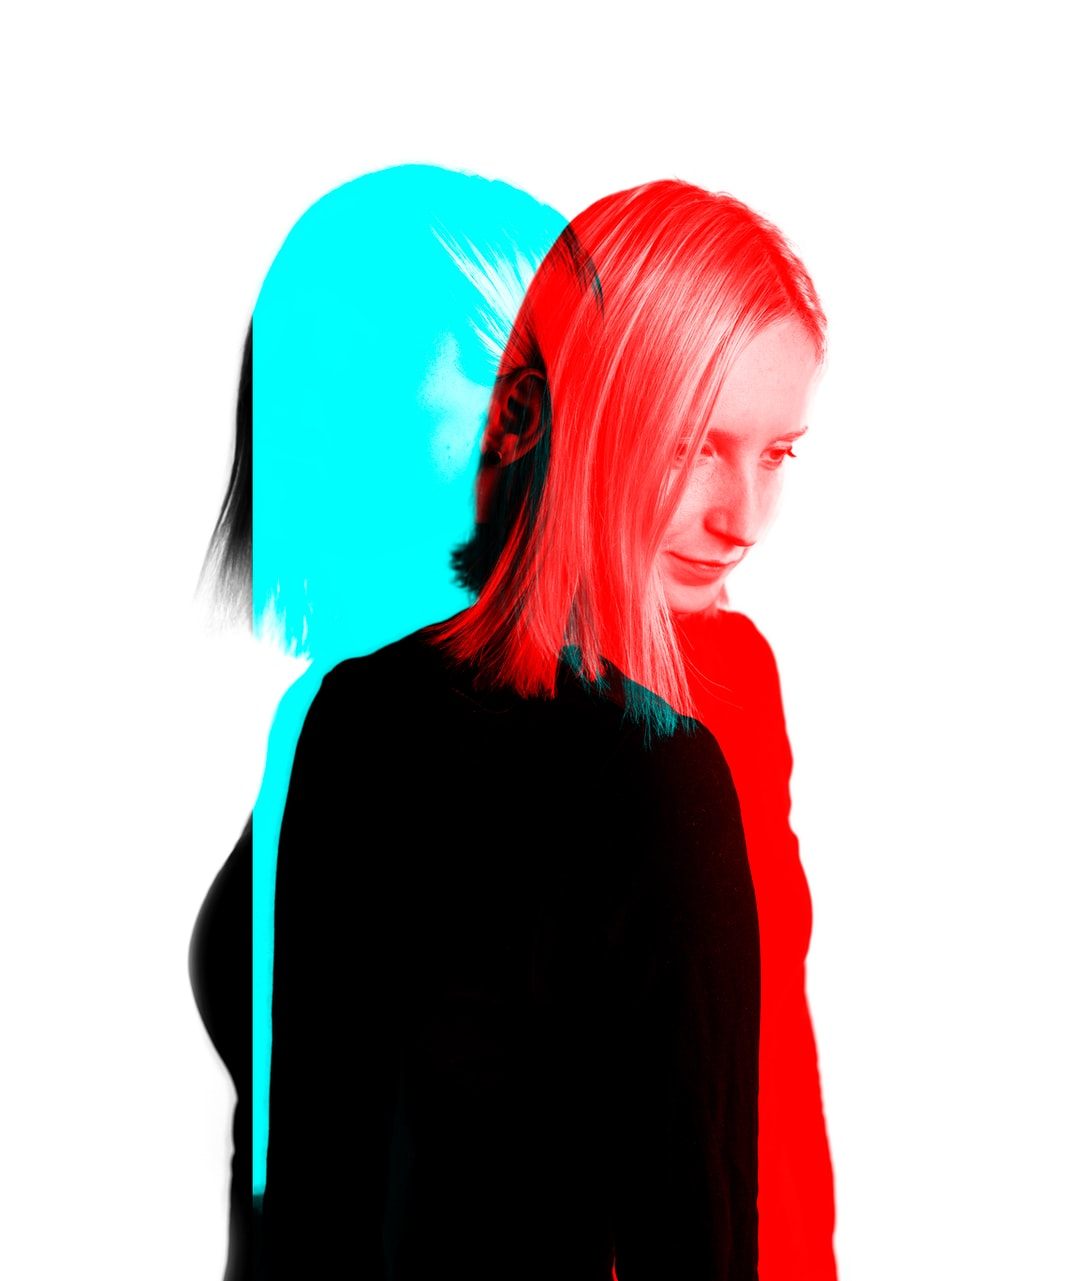 Double color exposure experiment